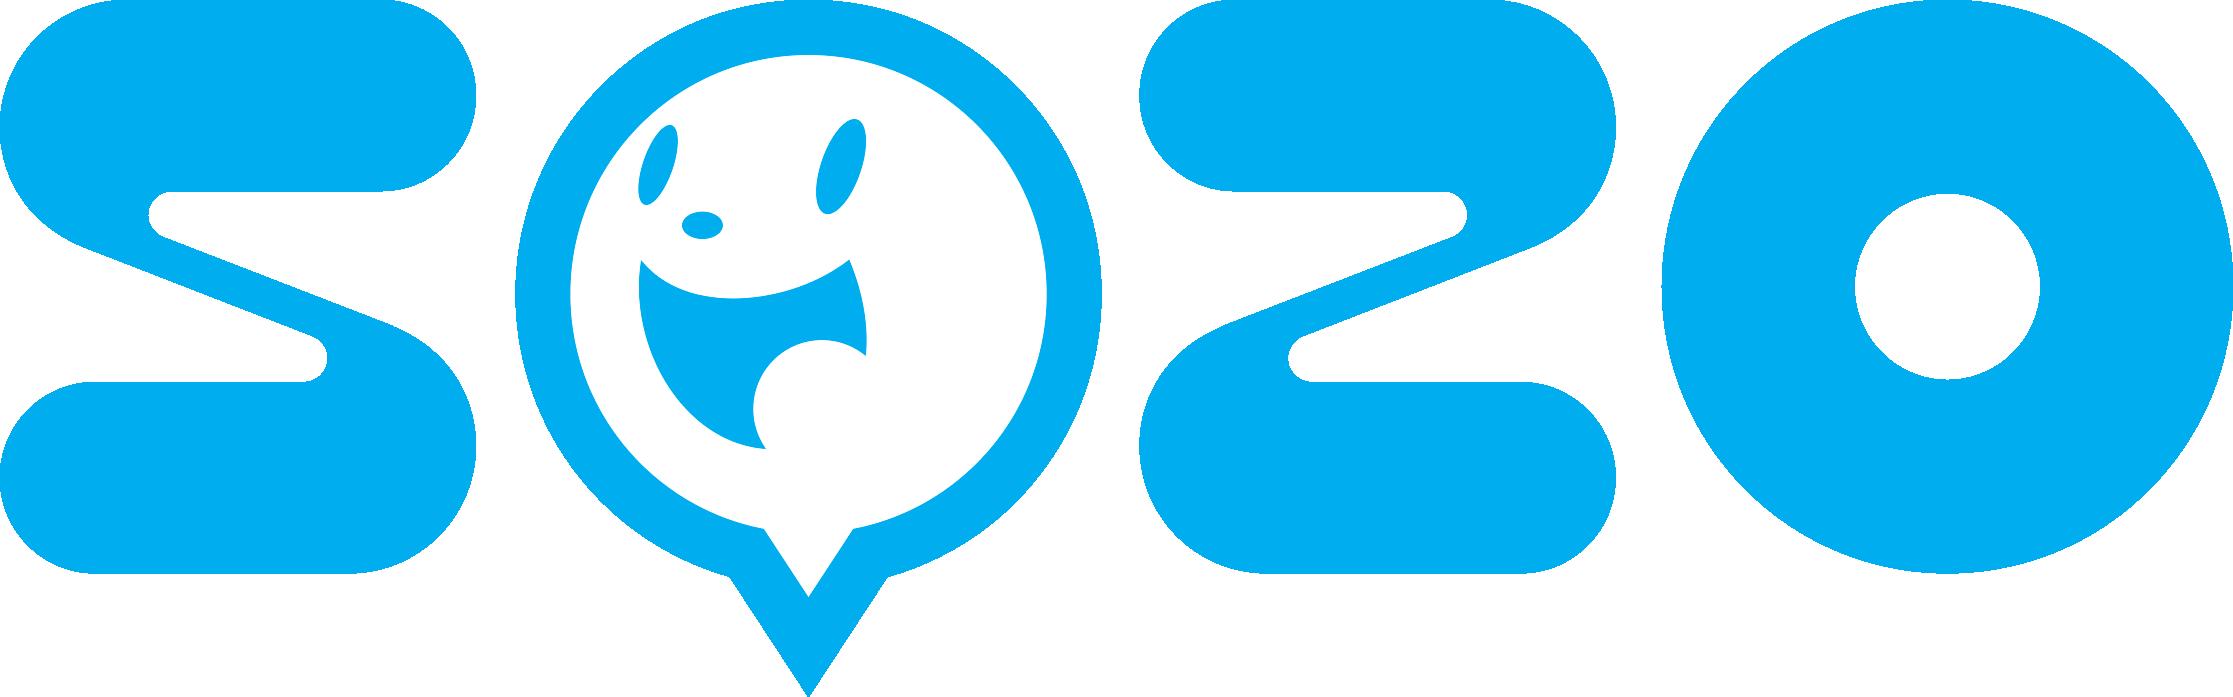 SOZO logo